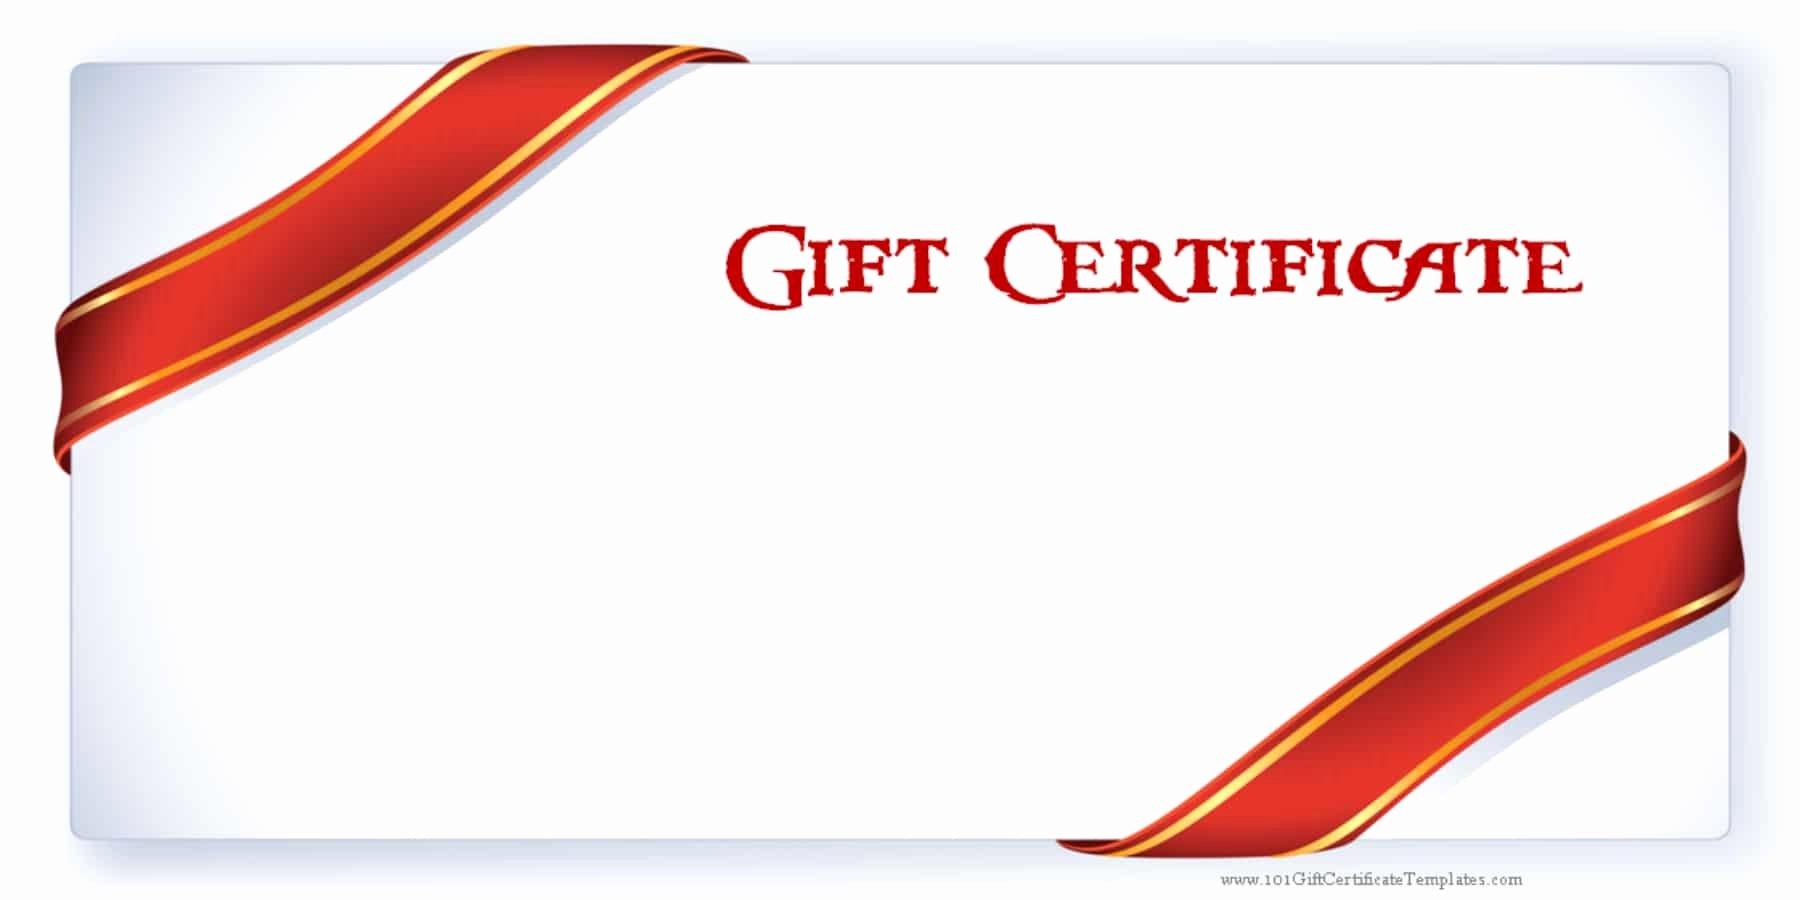 Gftlz Gift Certificate Template Inspirational What It is A Gift Certificate Template